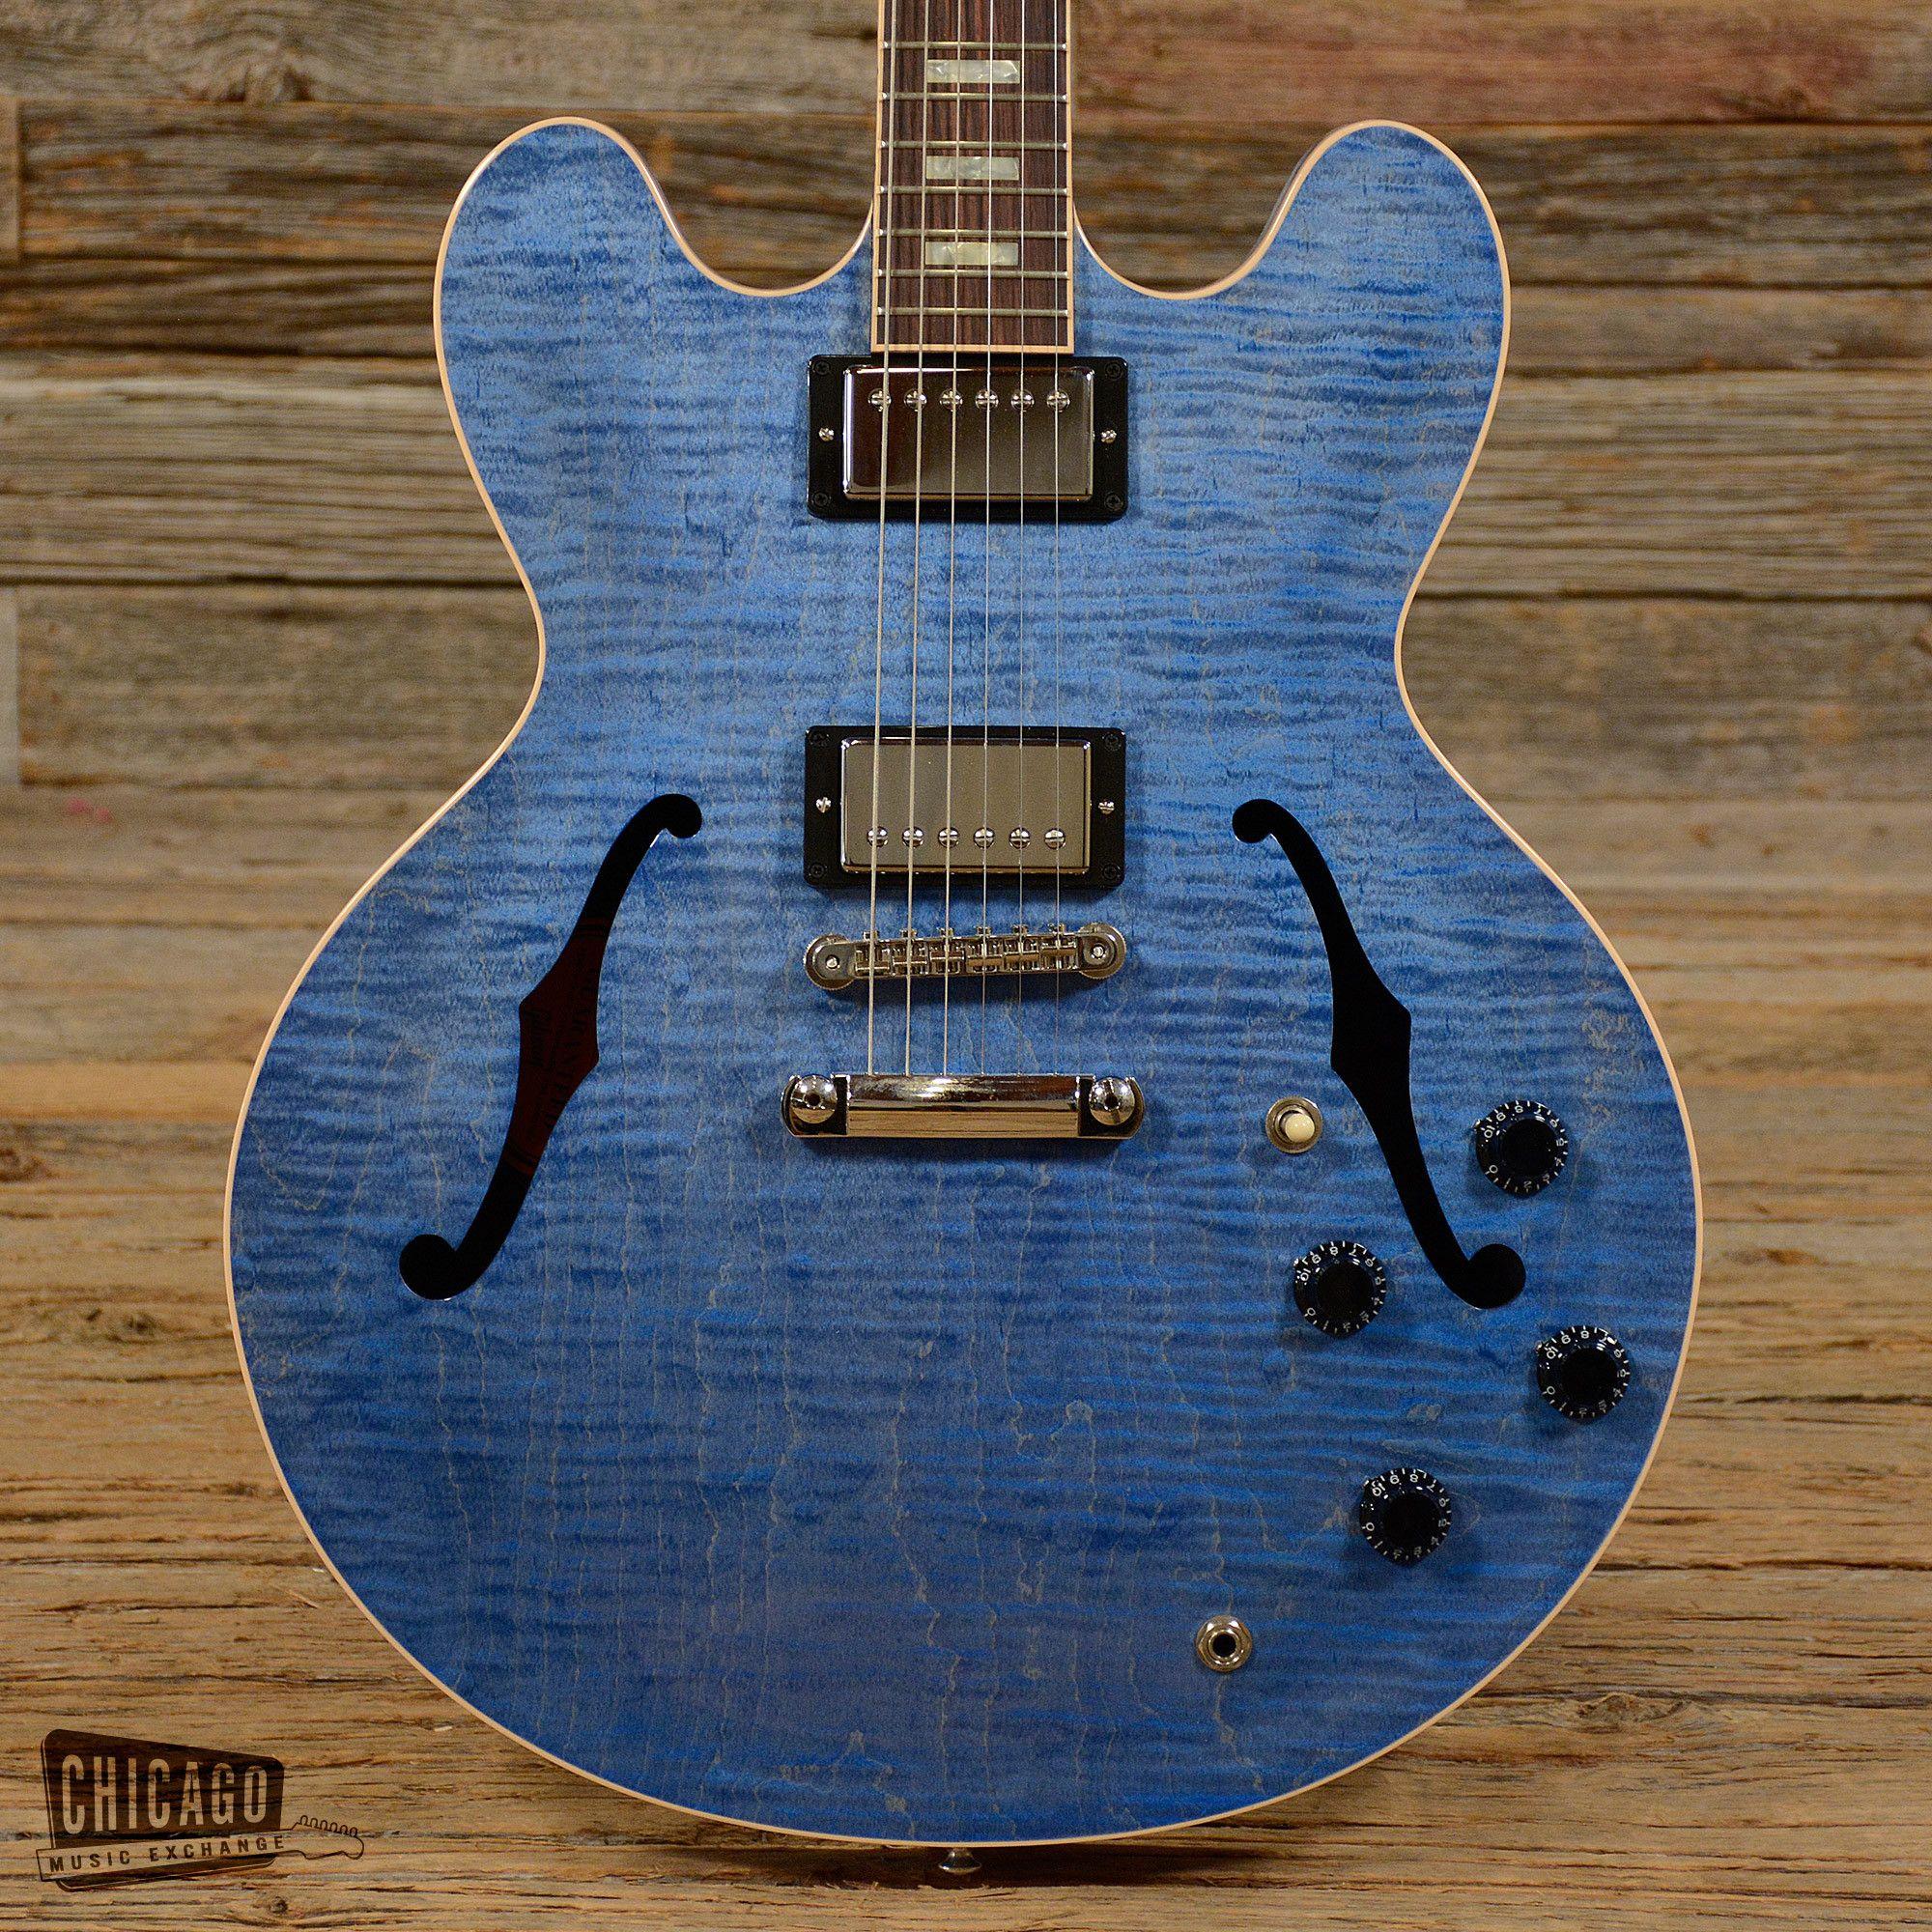 gibson es 335 indigo 2015 used s708 cool guitars pinterest